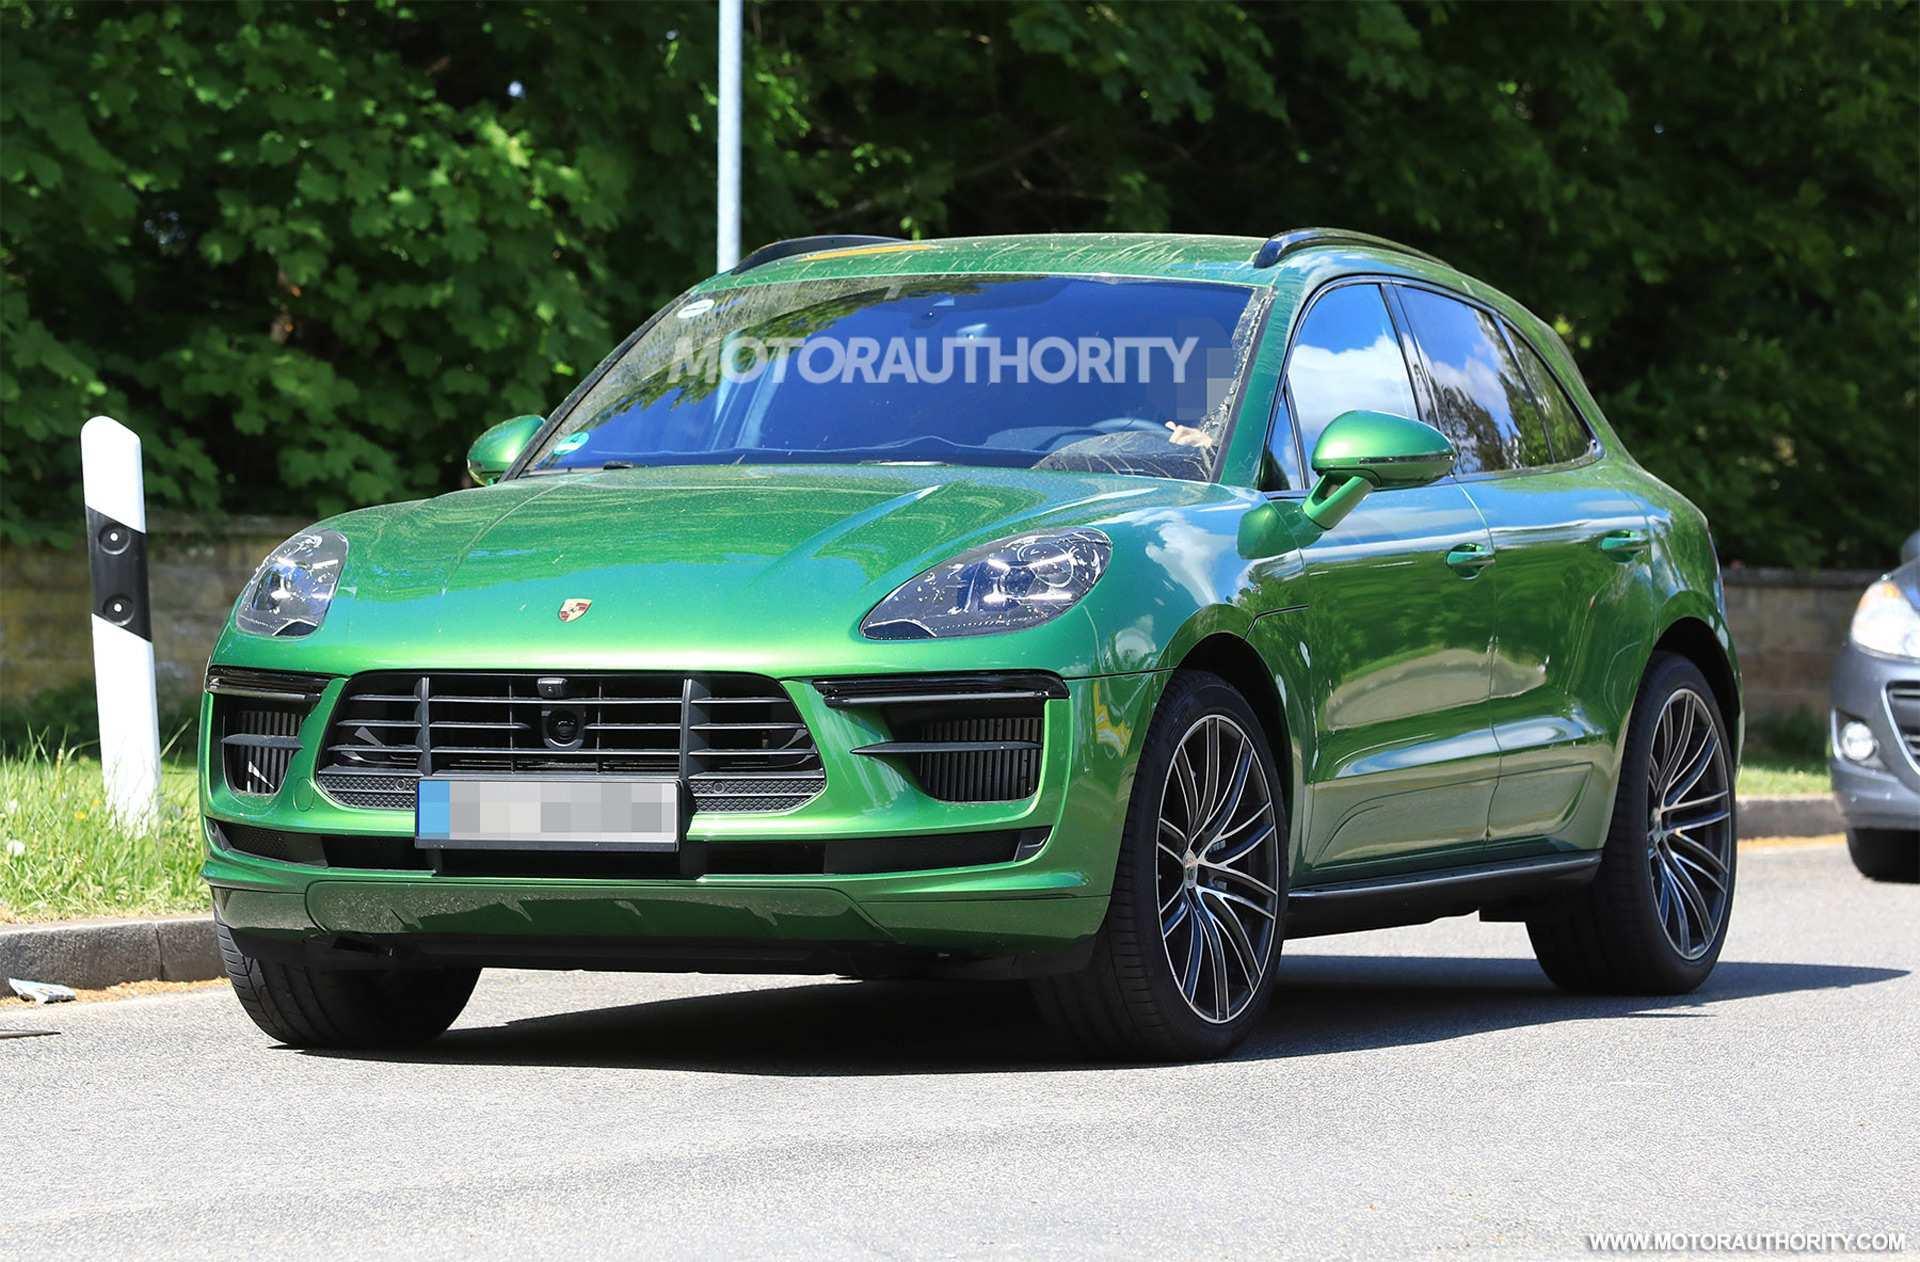 57 Concept of 2019 Porsche Macan Gts History with 2019 Porsche Macan Gts